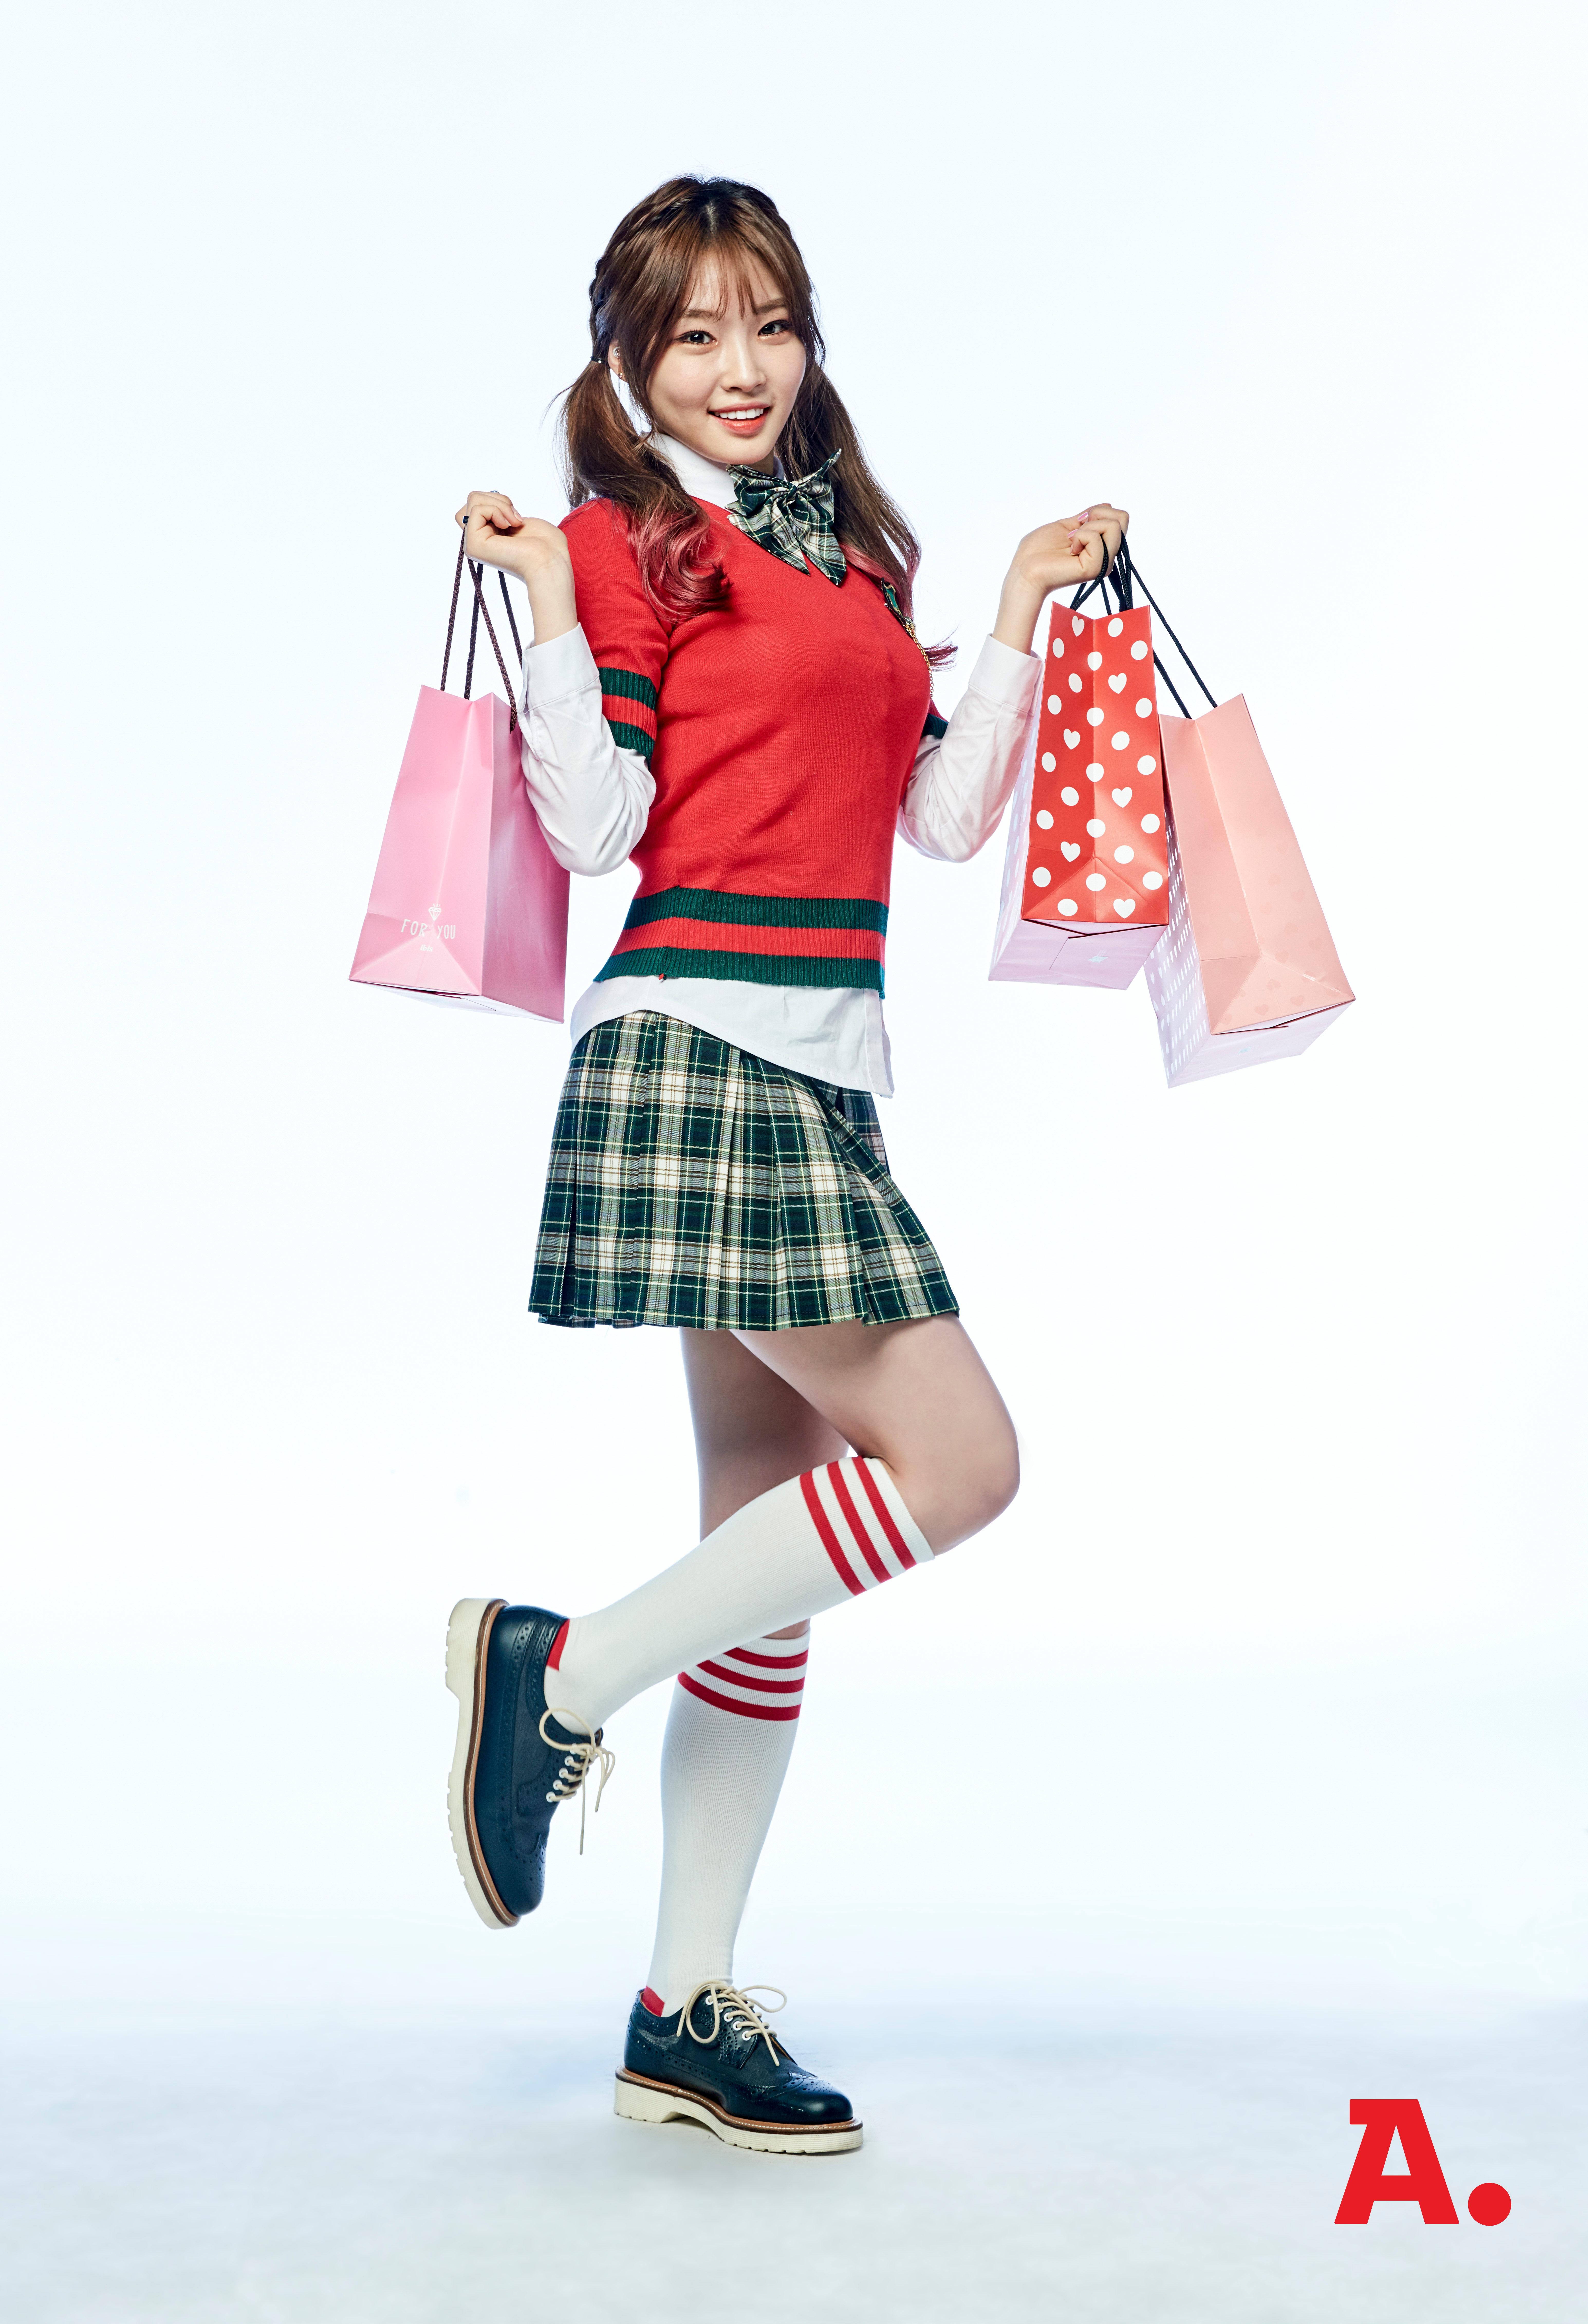 Kim Chung Ha Androidiphone Wallpaper 50337 Asiachan Kpop Image Board